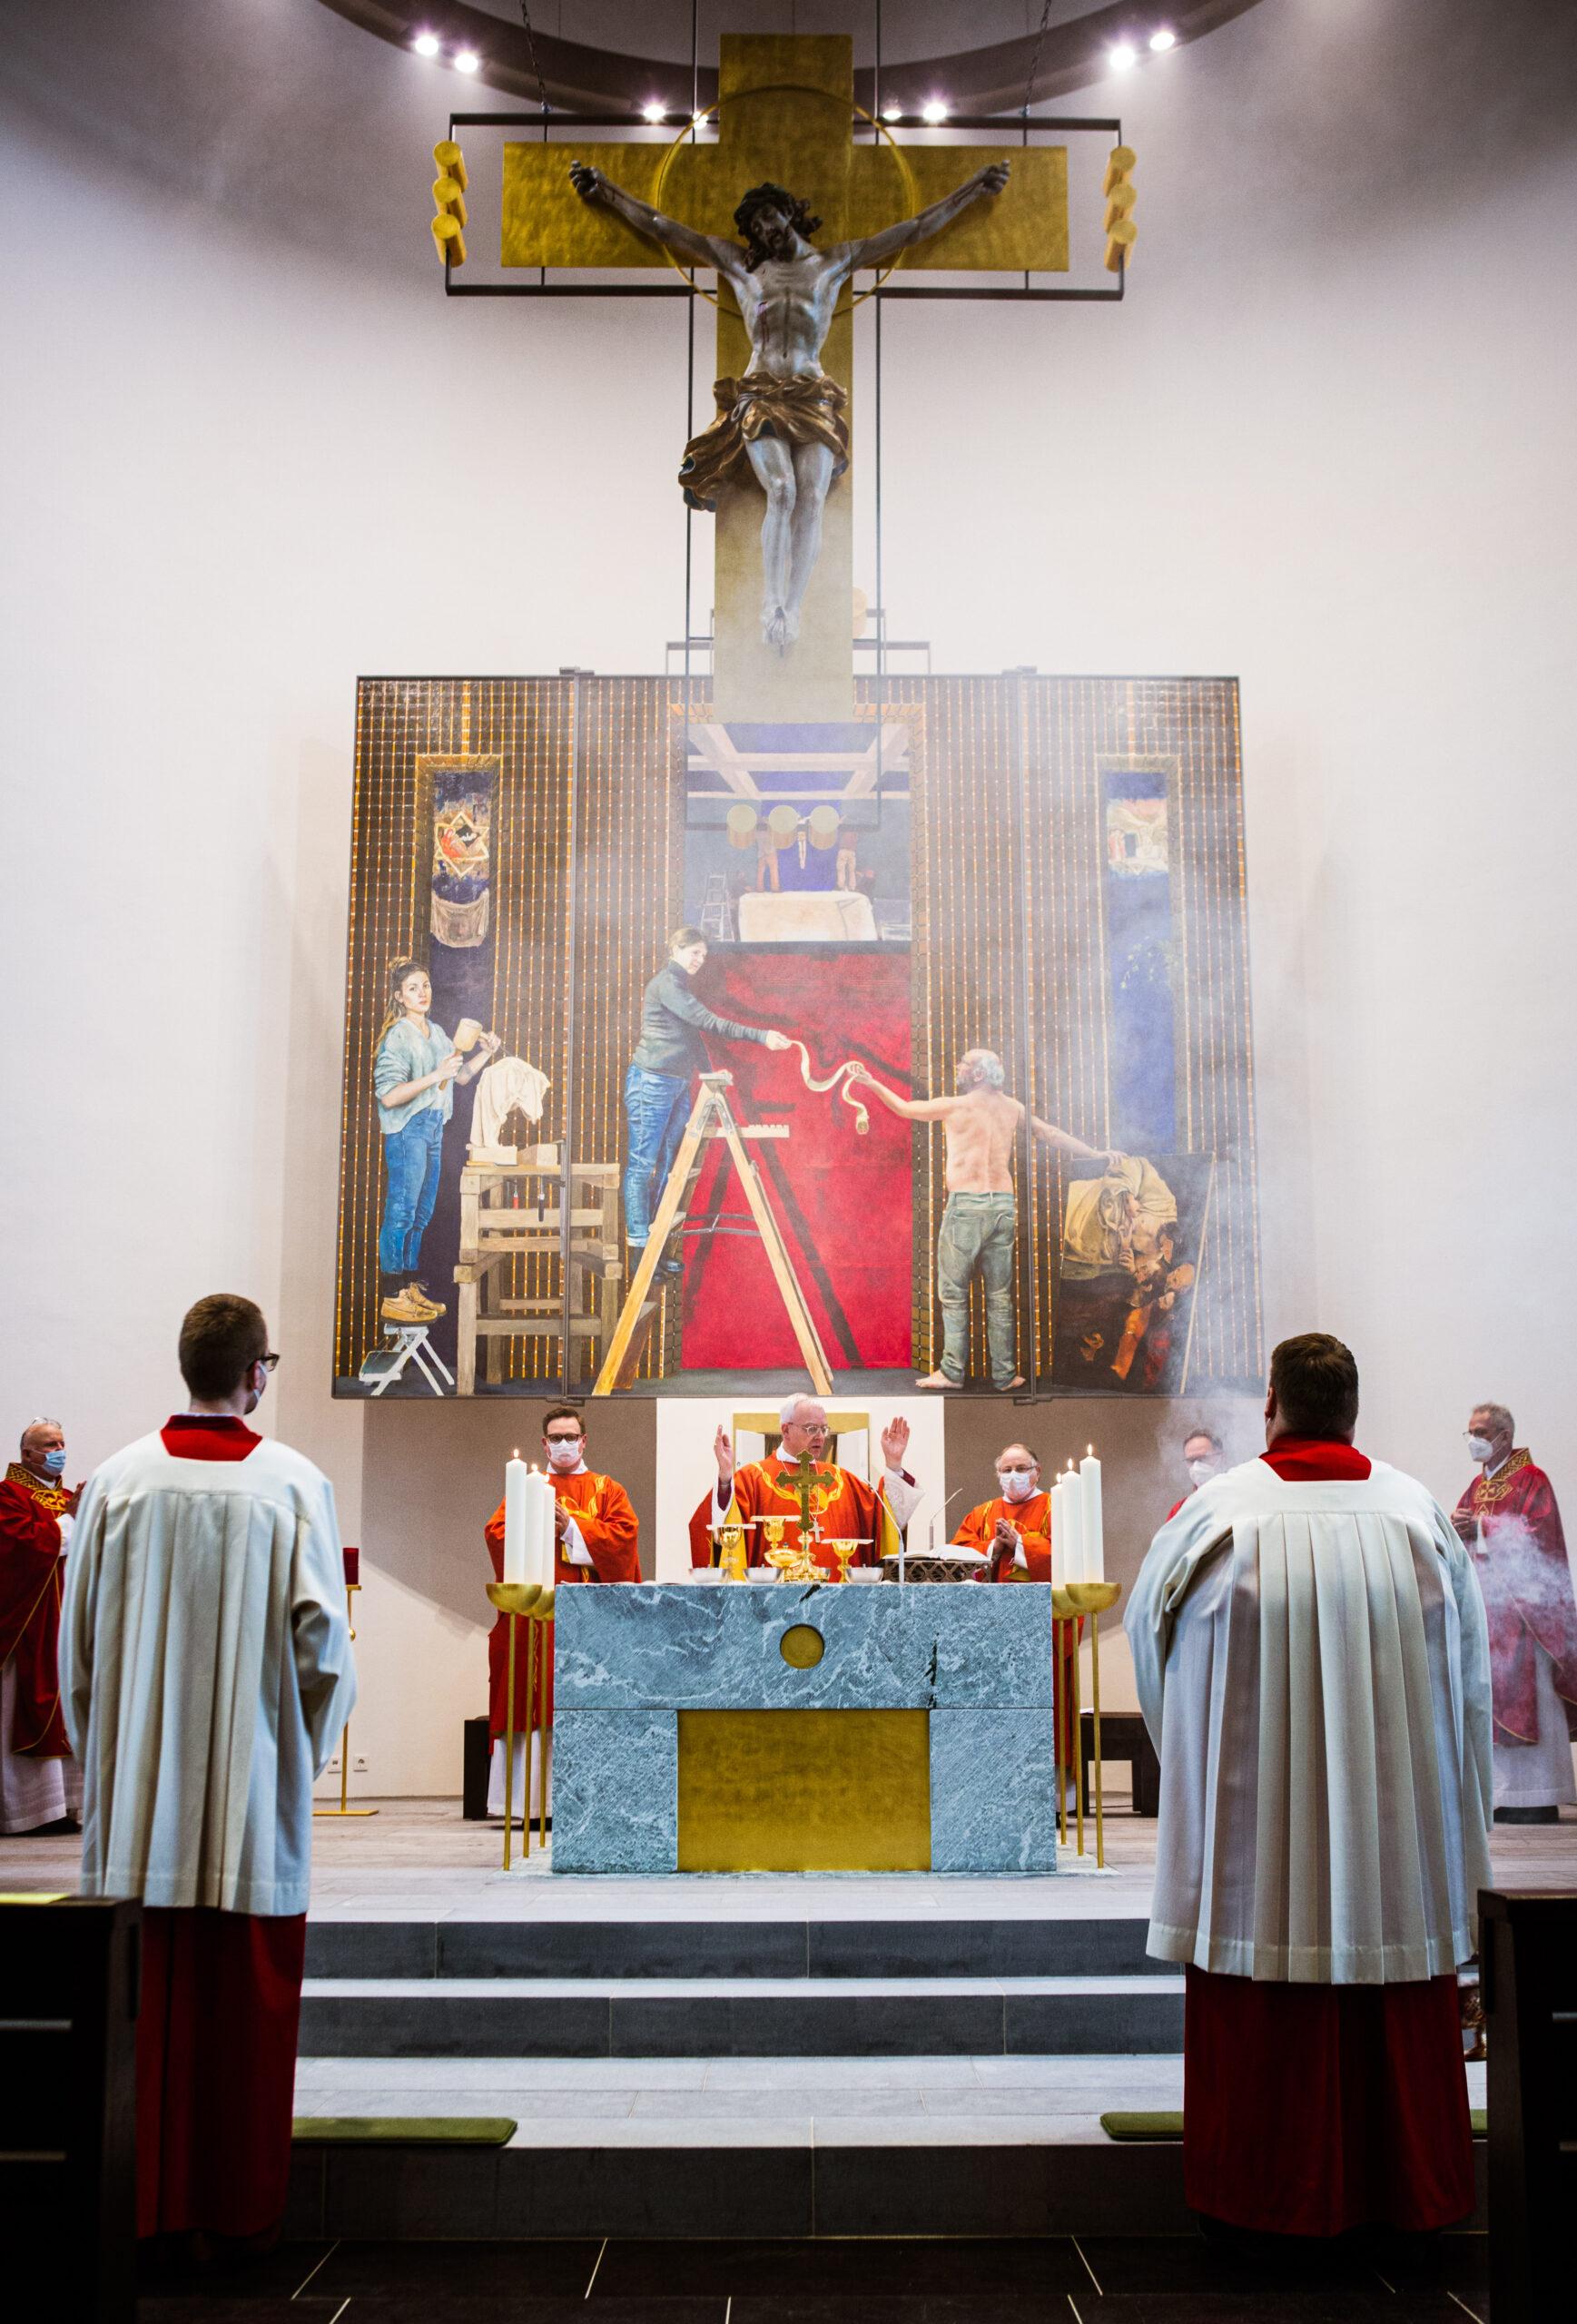 St. Clemens Drolshagen